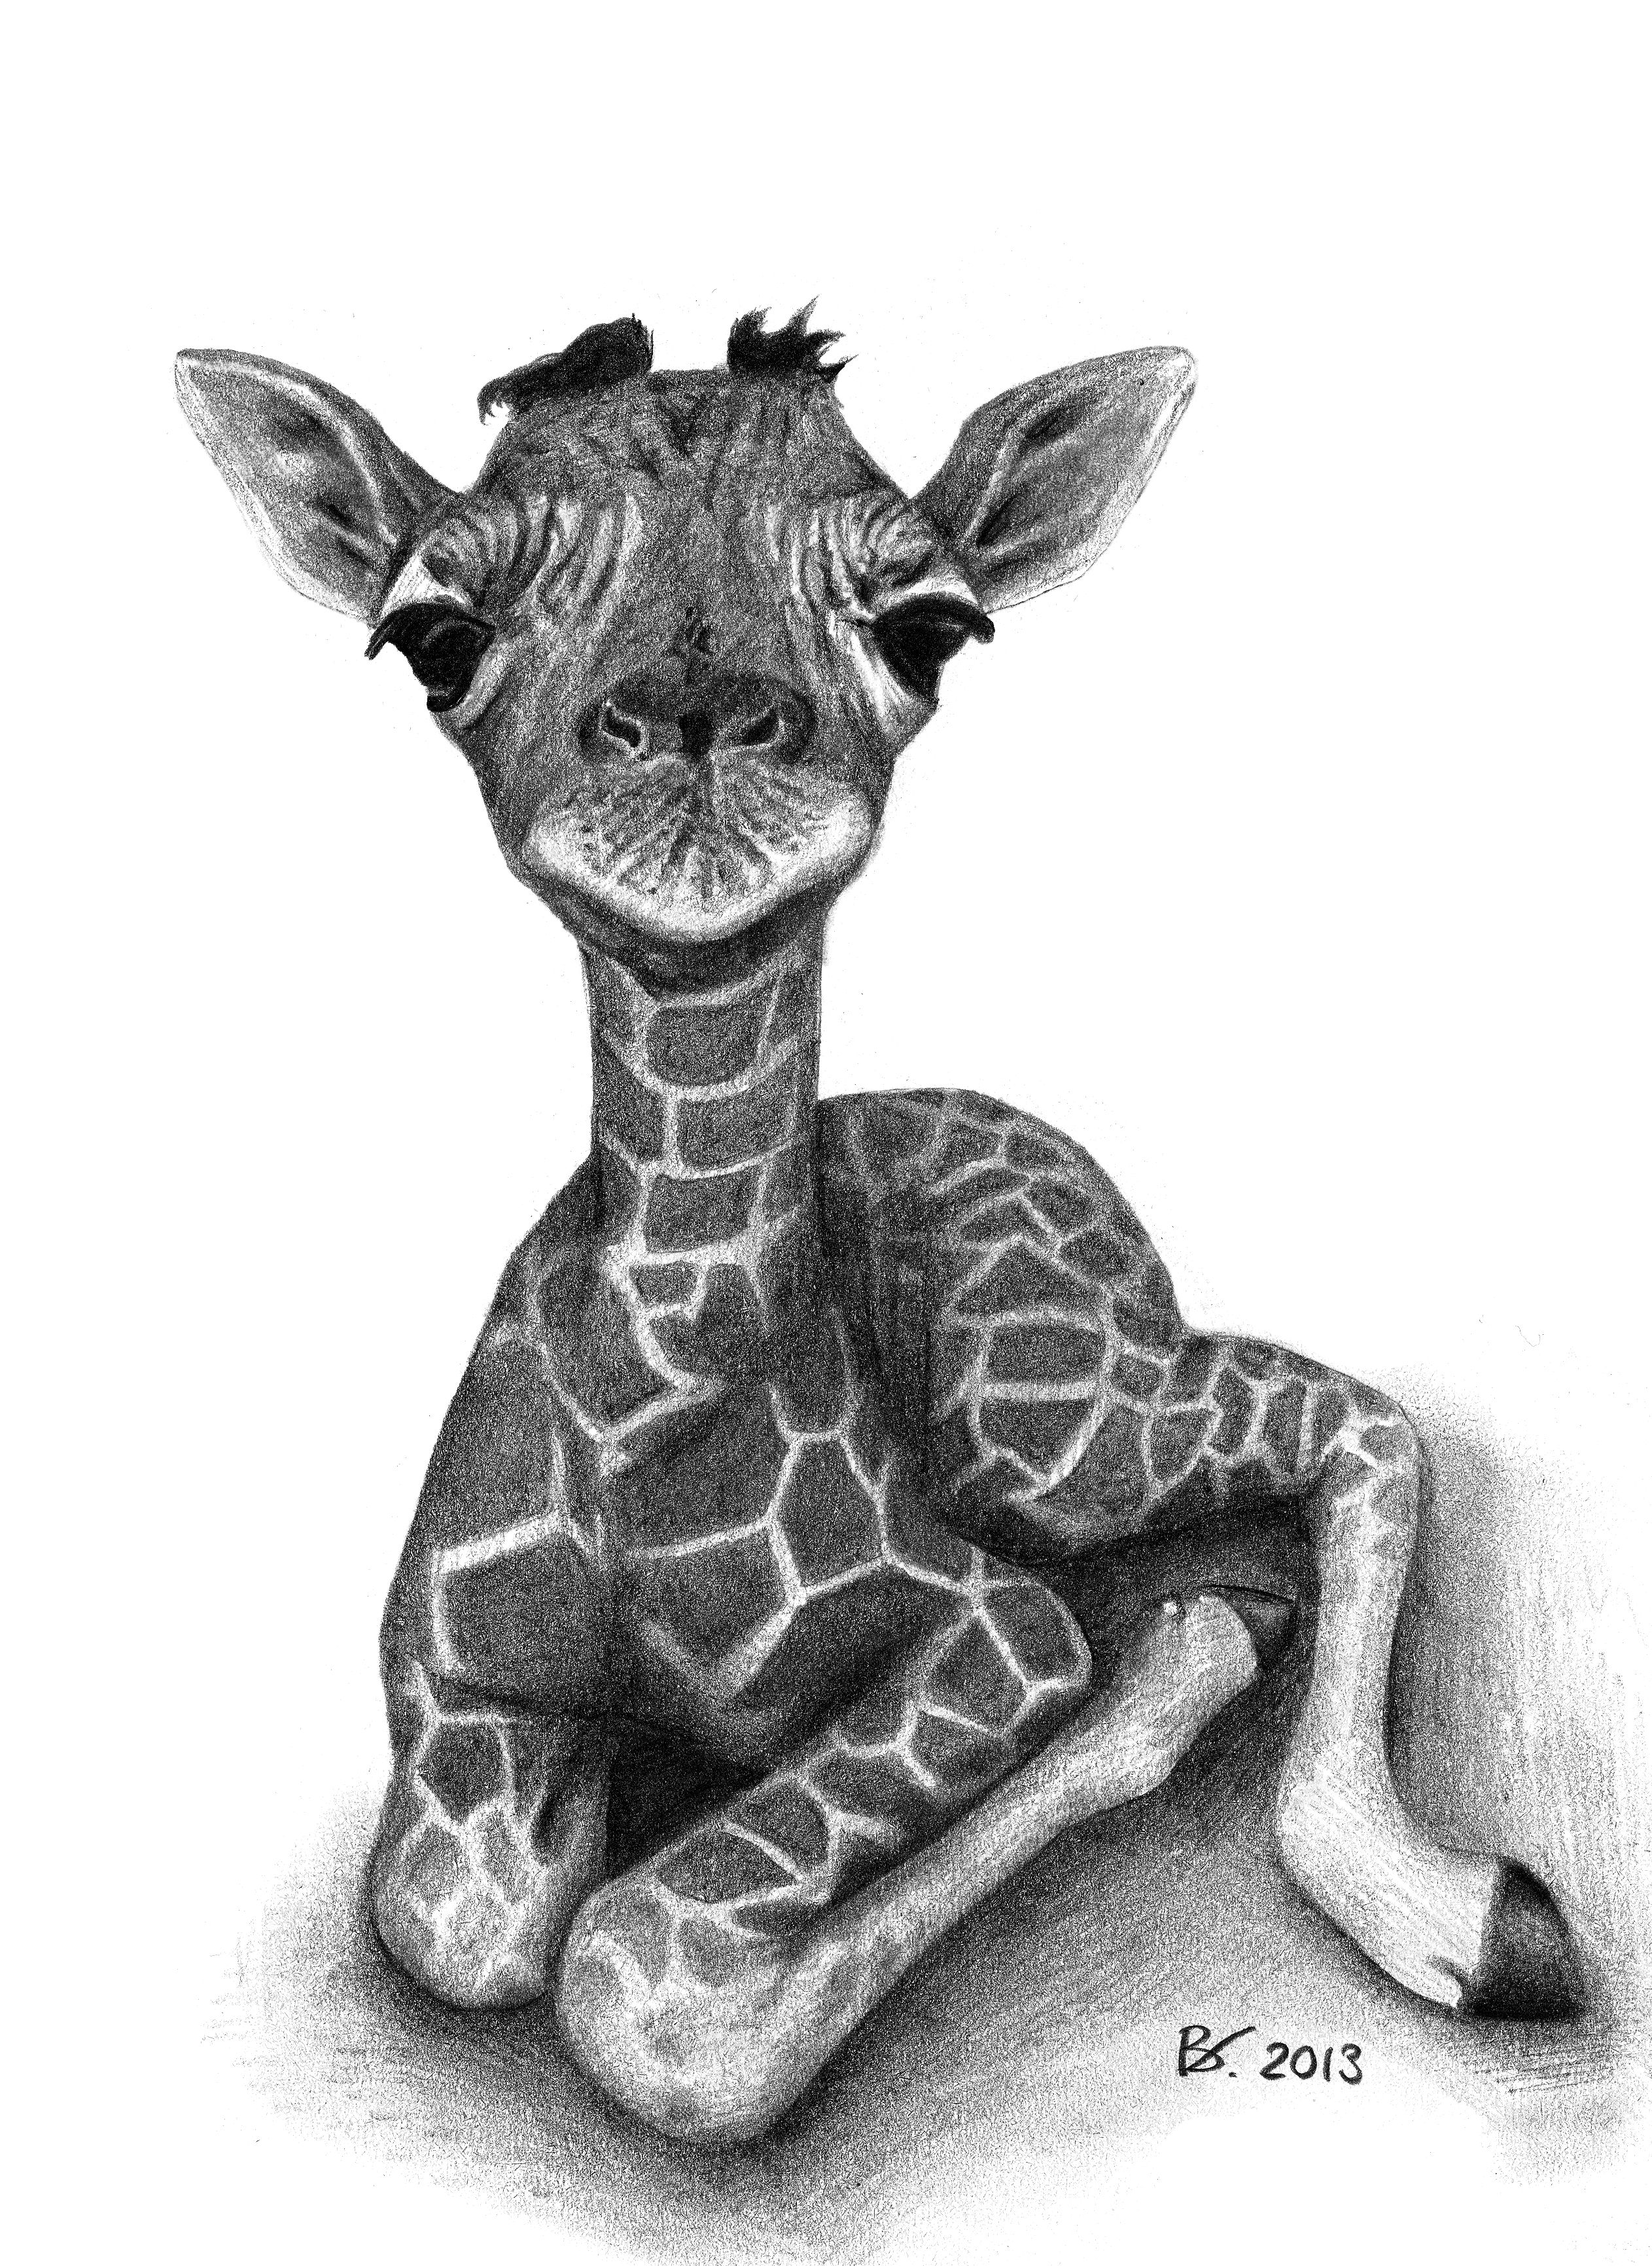 Drawing of a cute baby giraffe. Realism, animal, fine arts